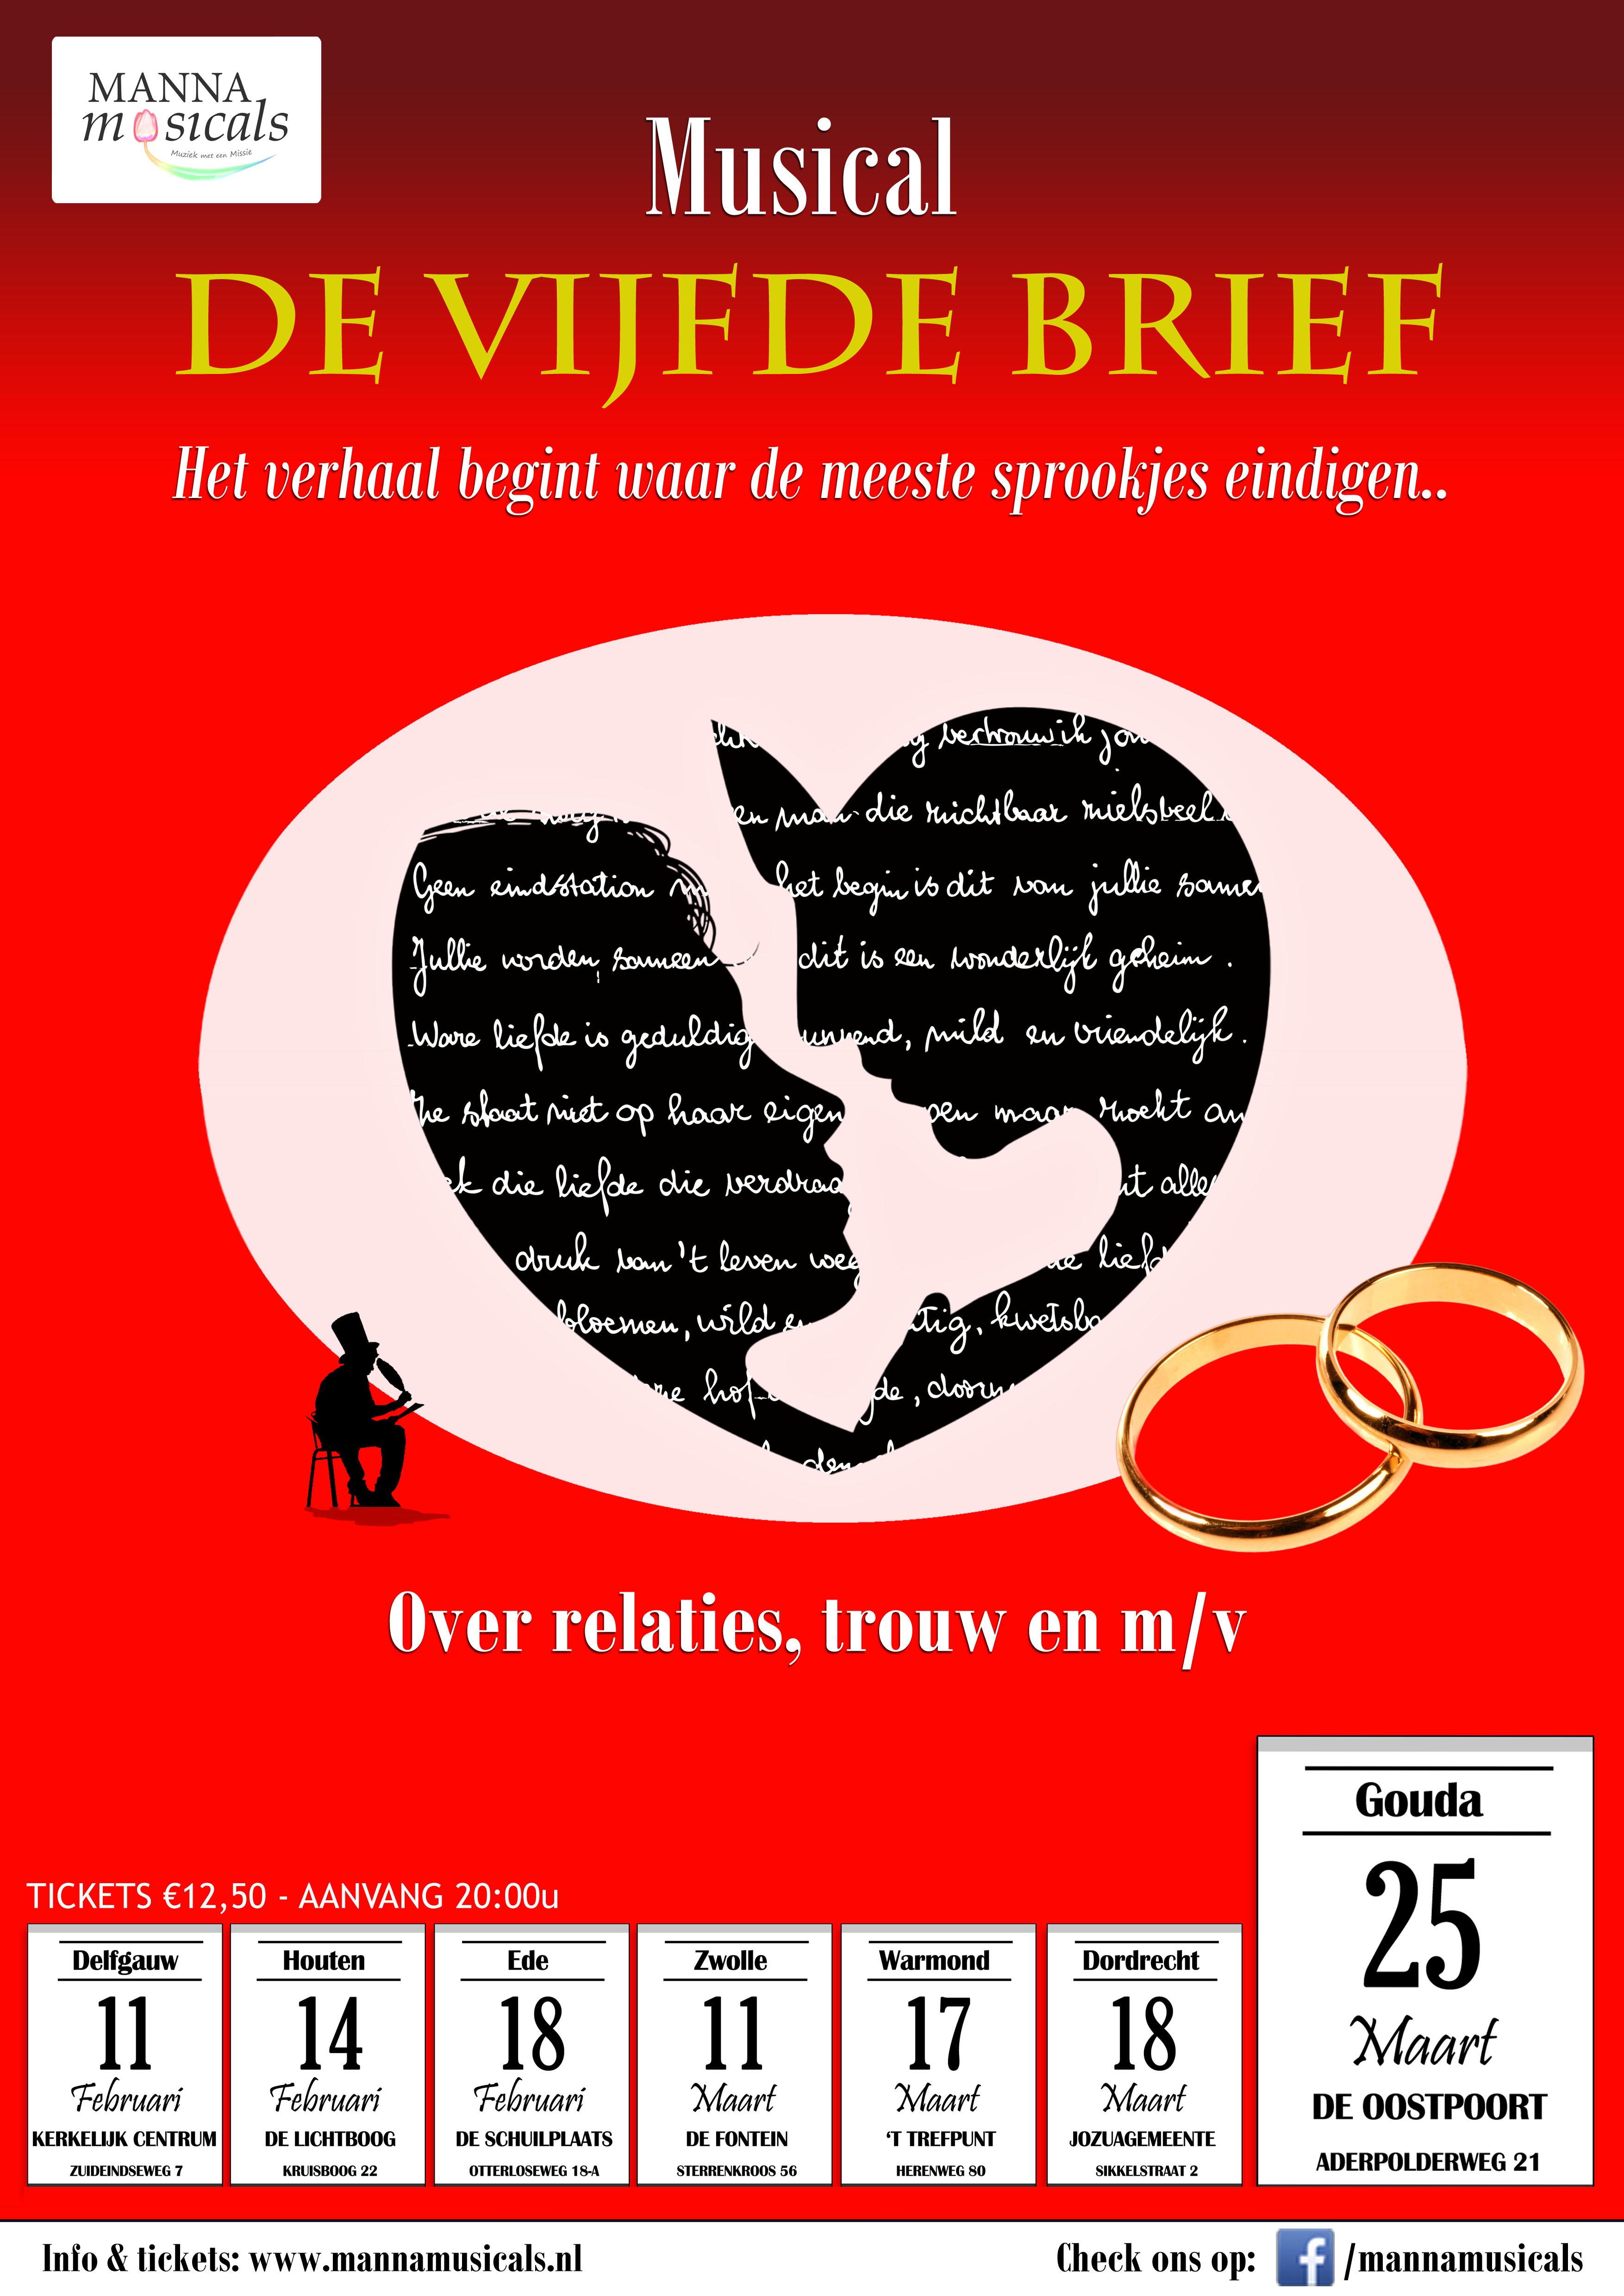 VijfdeBrief Poster Gouda